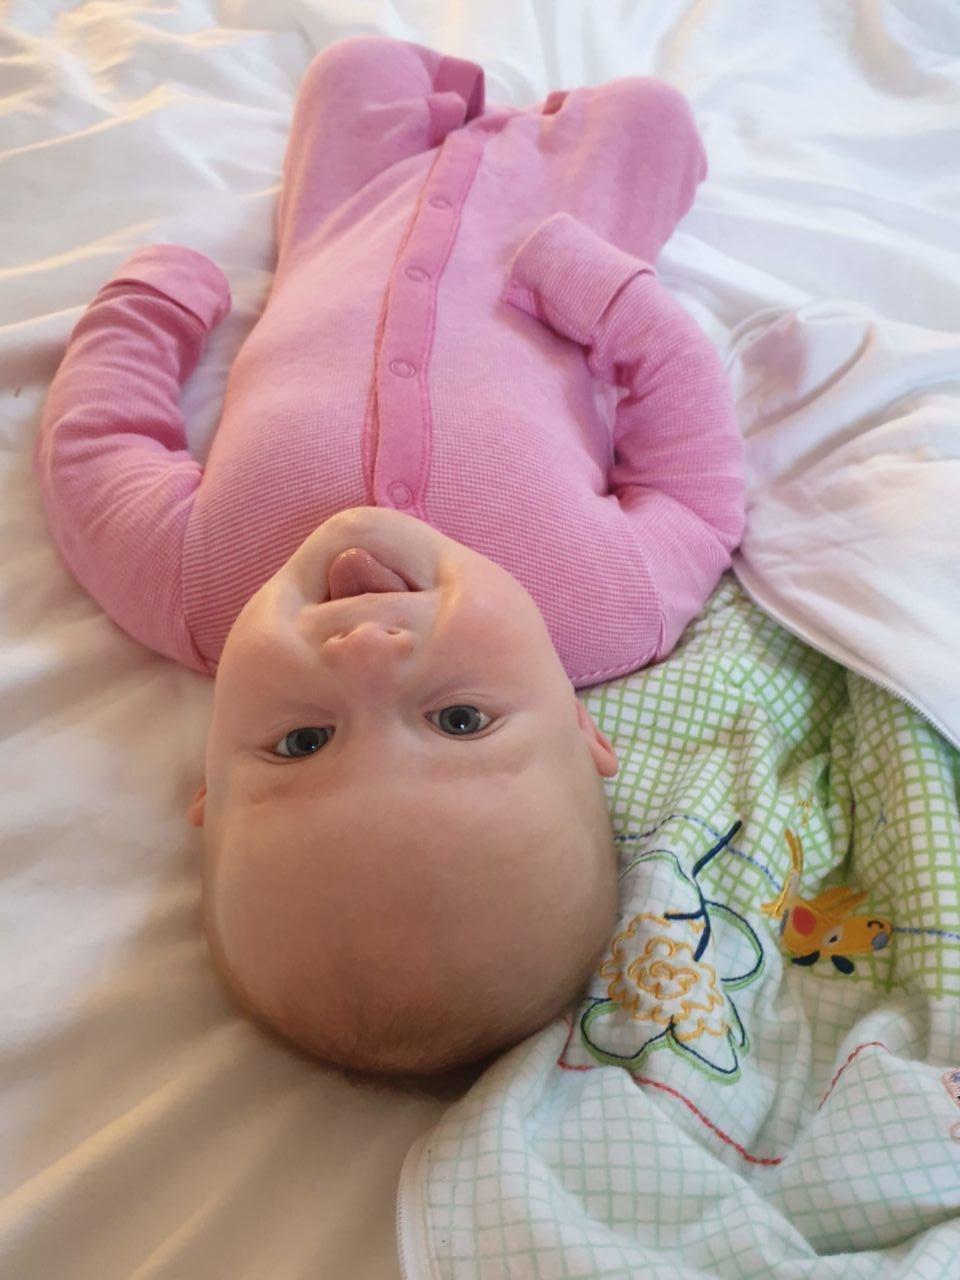 Emmy at 7 months